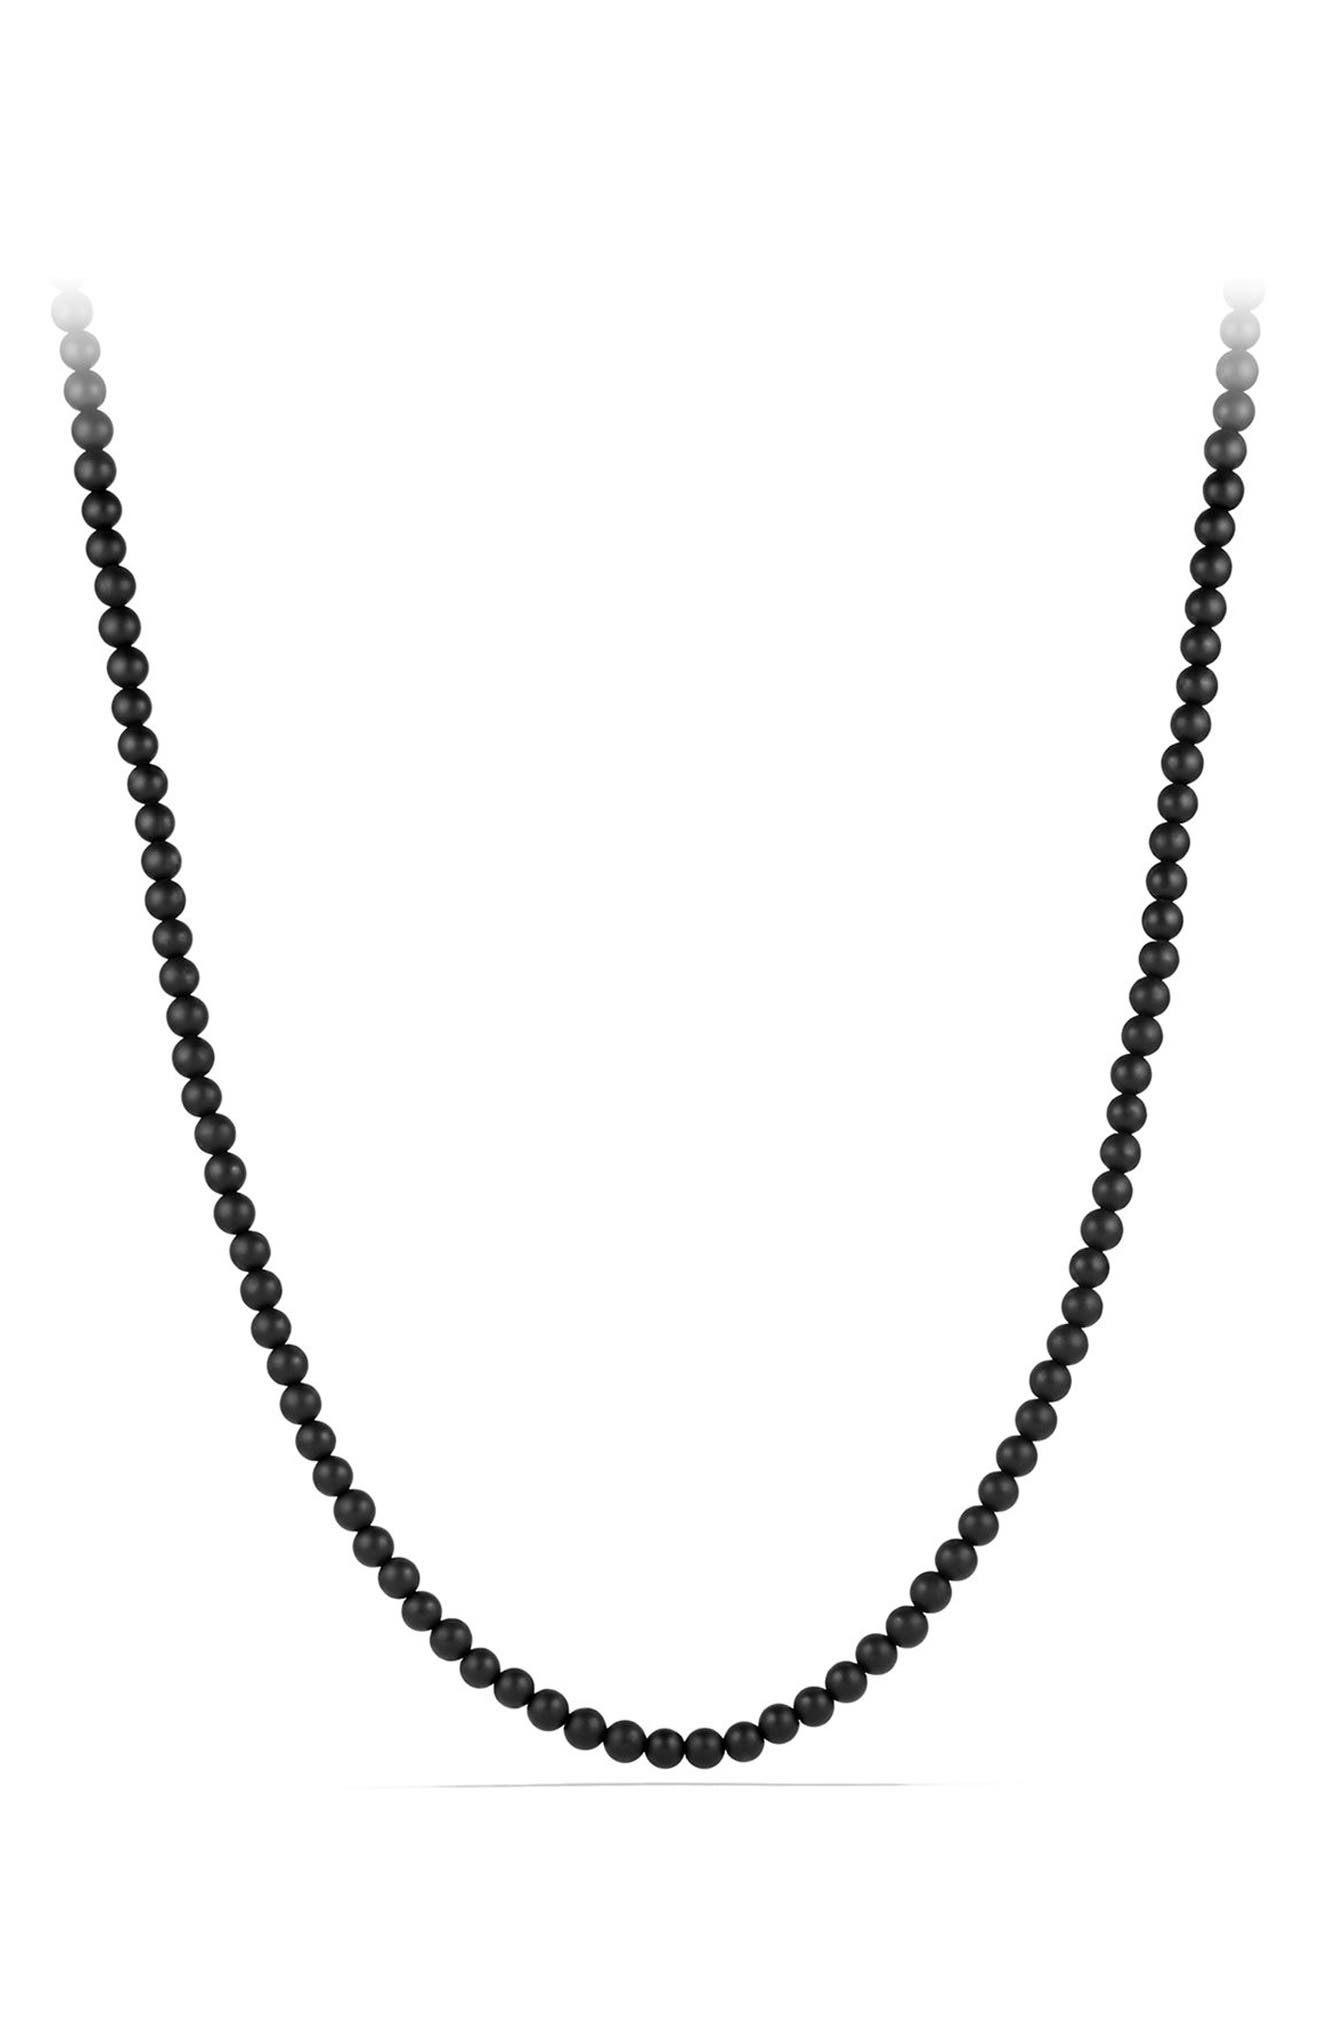 David Yurman 'Spiritual Beads' Necklace with Stone